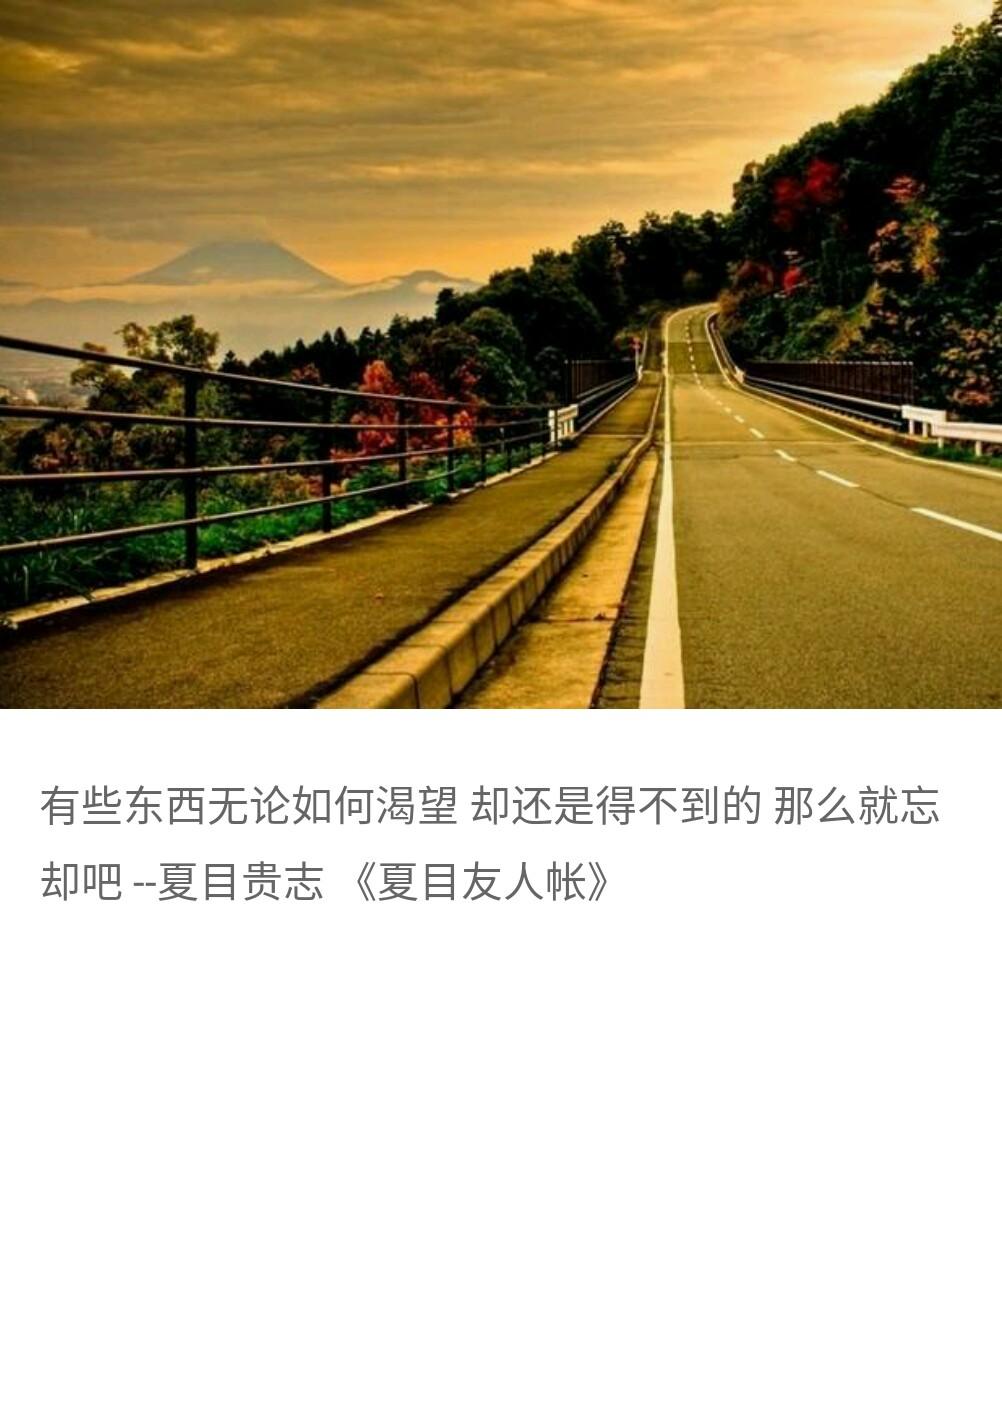 http://www.58100.com/pid/610331.html